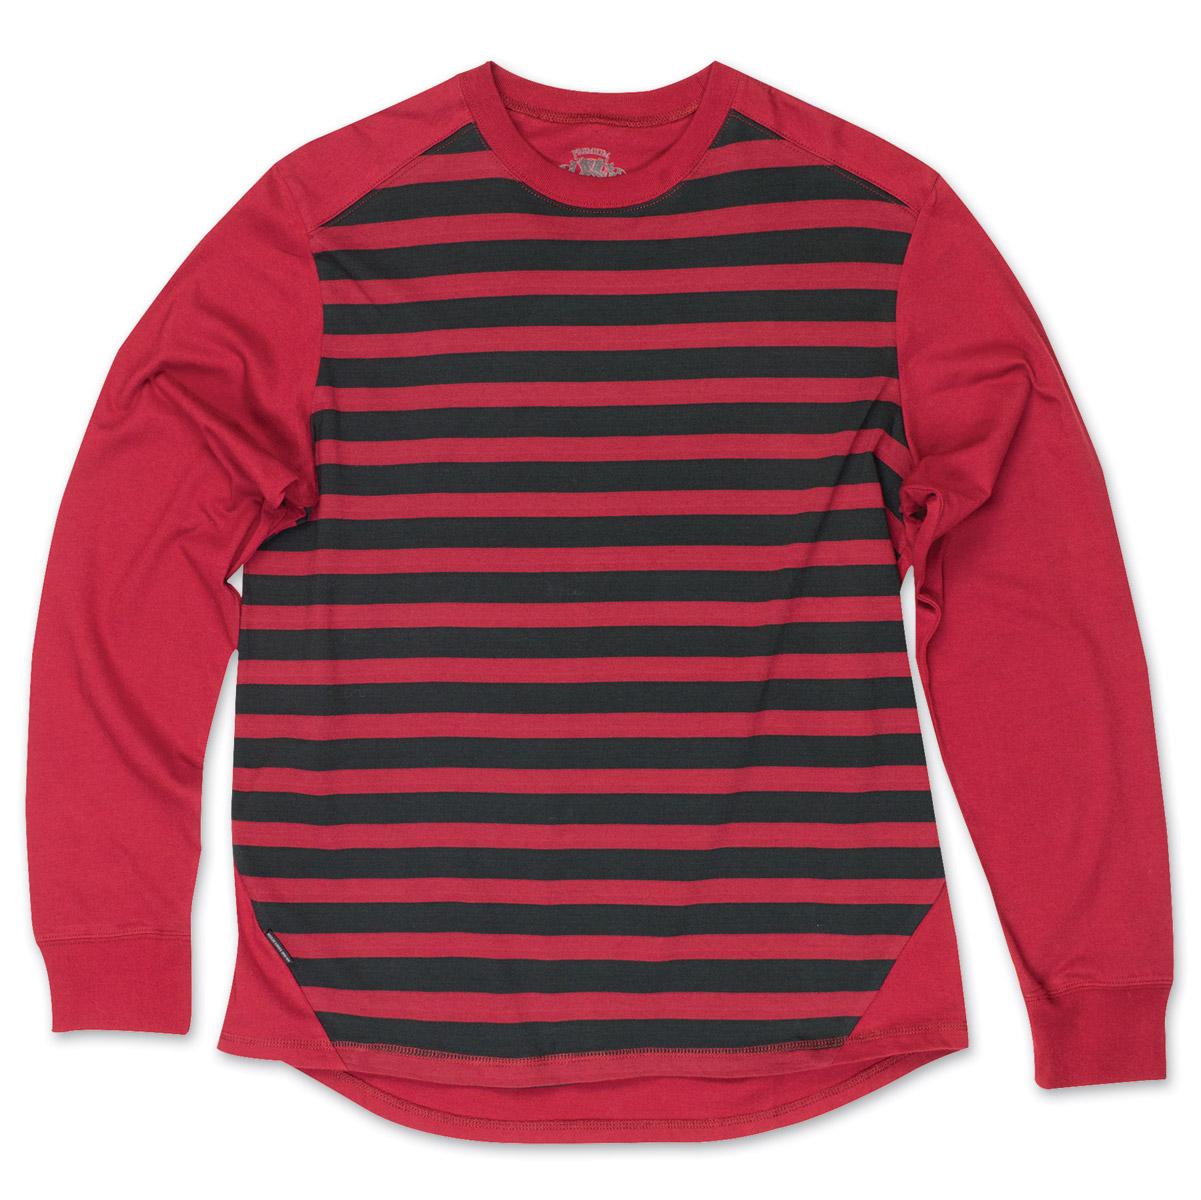 Roland Sands Design Men's County Oxblood/Black Long Sleeve T-Shirt